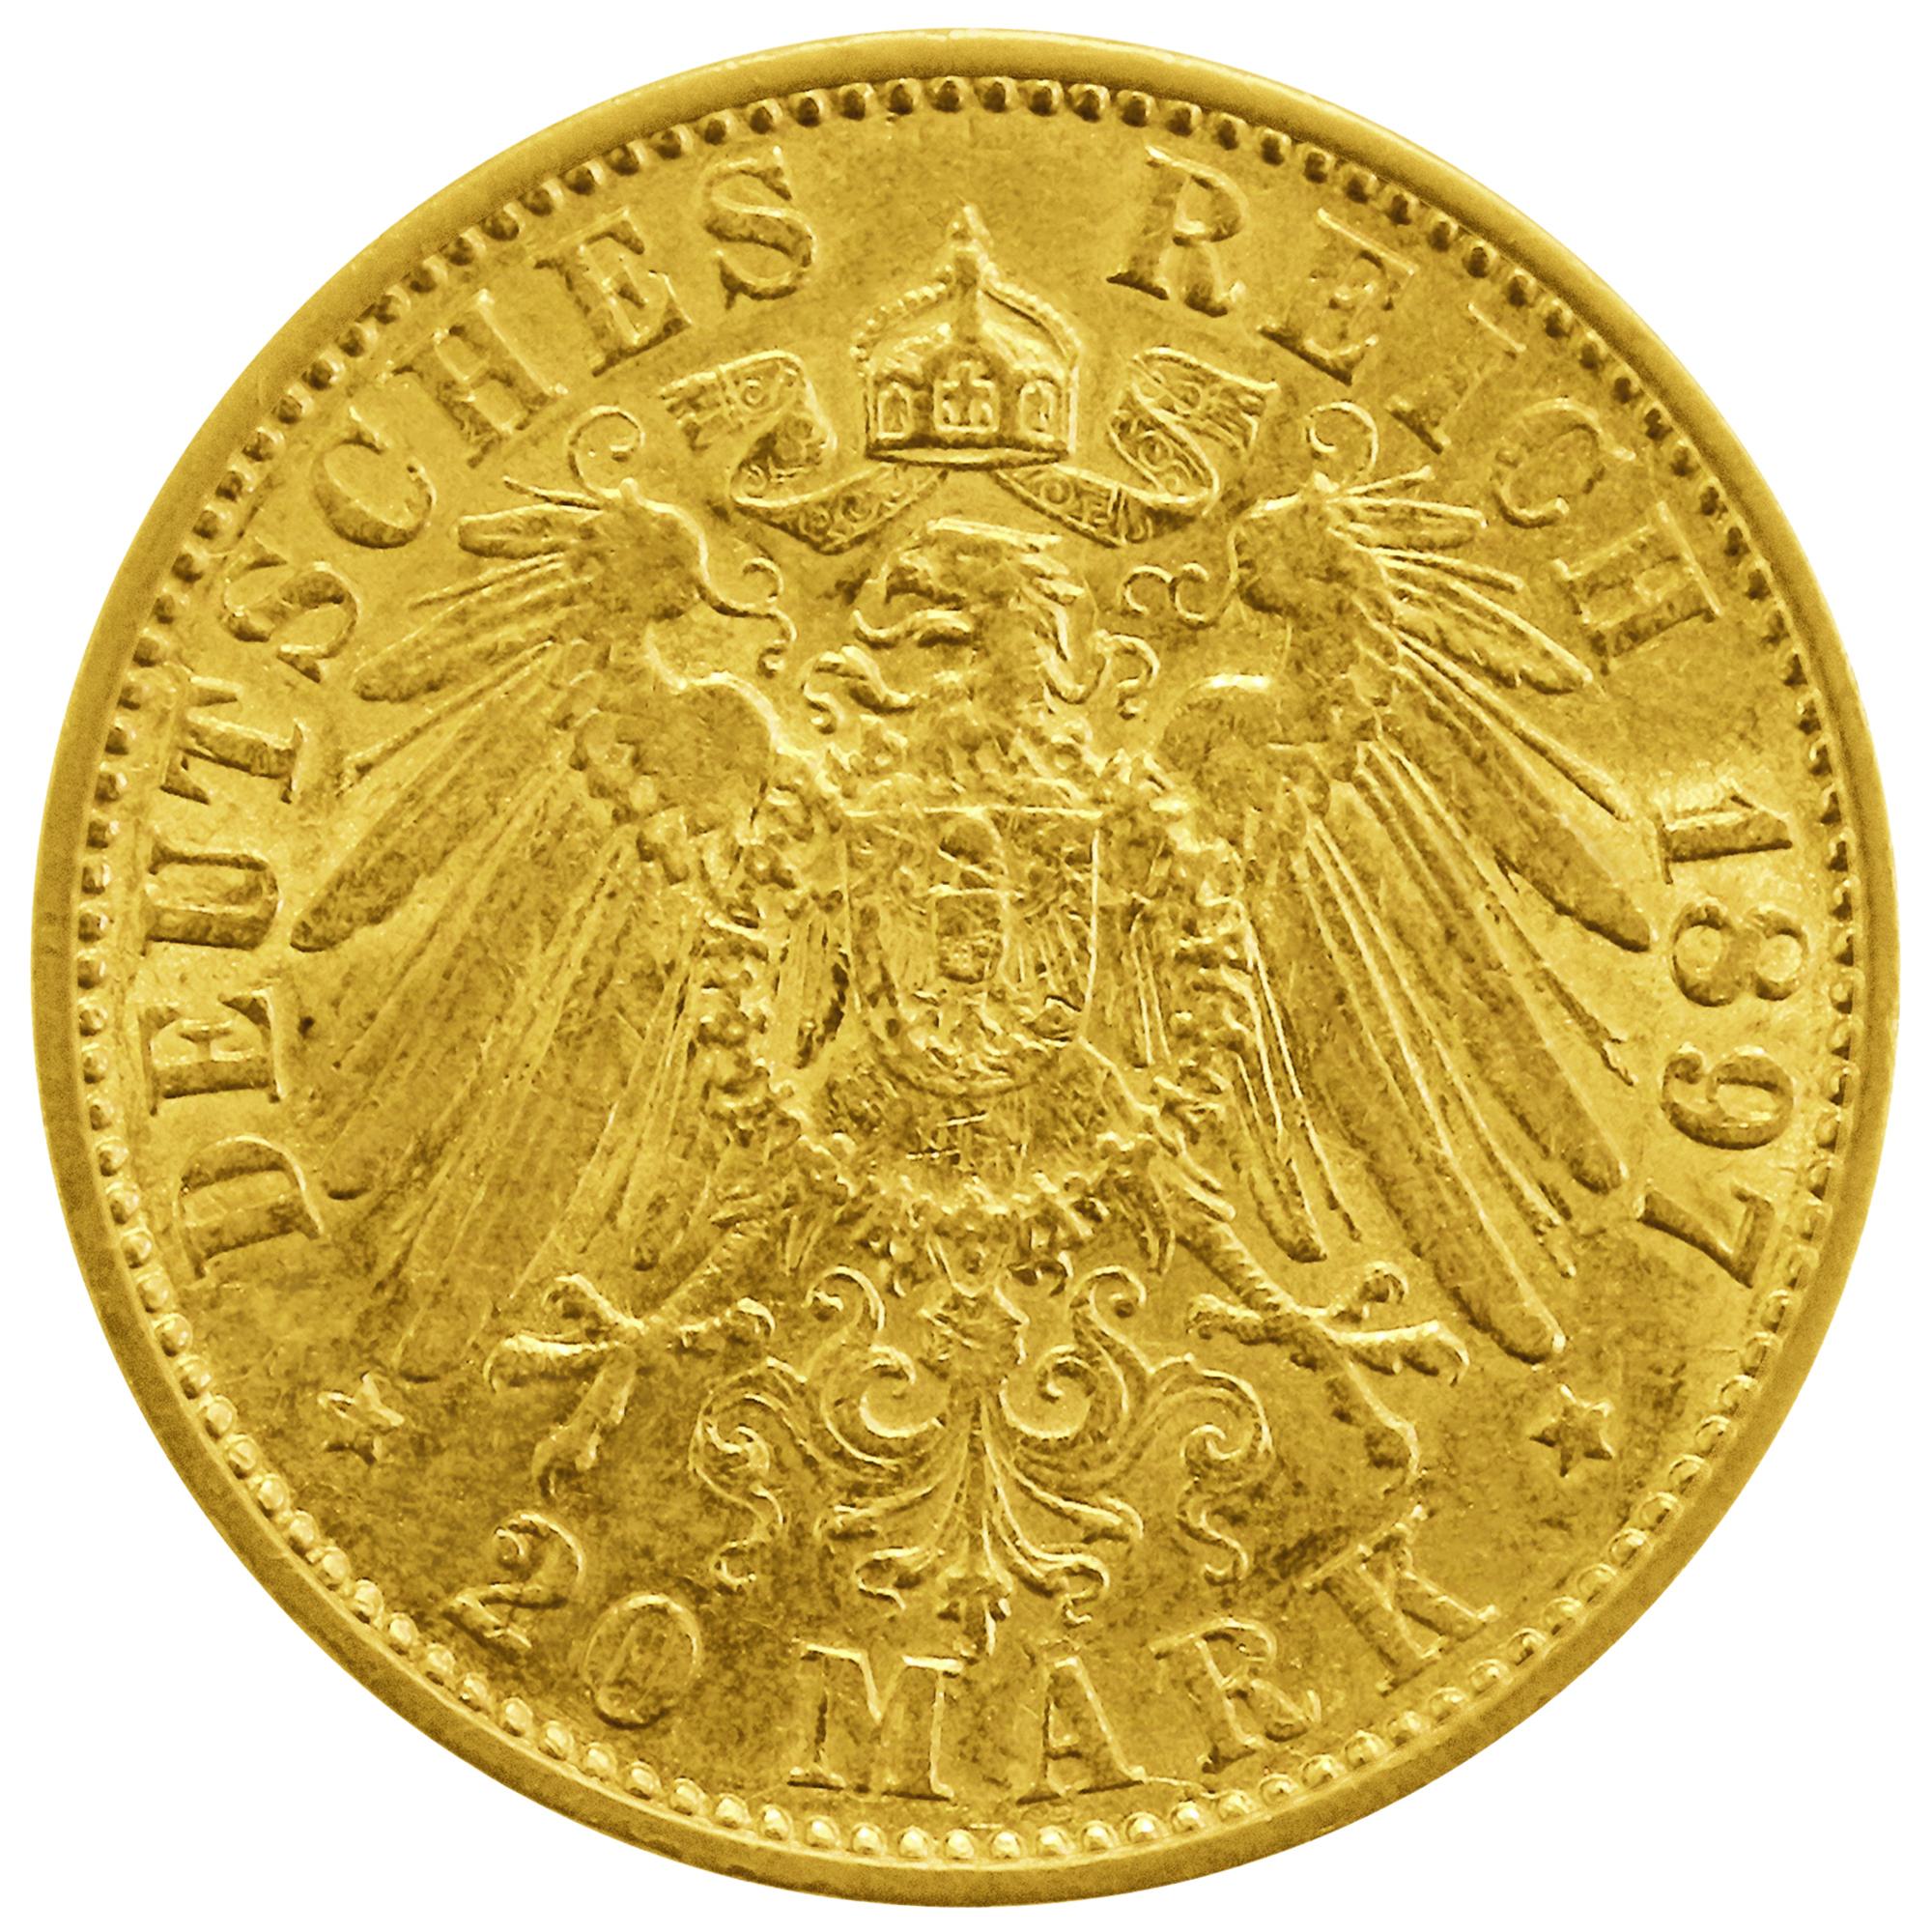 Goldmünze Hamburg 20 Goldmark Kaufen Haspa Goldshop Haspashop